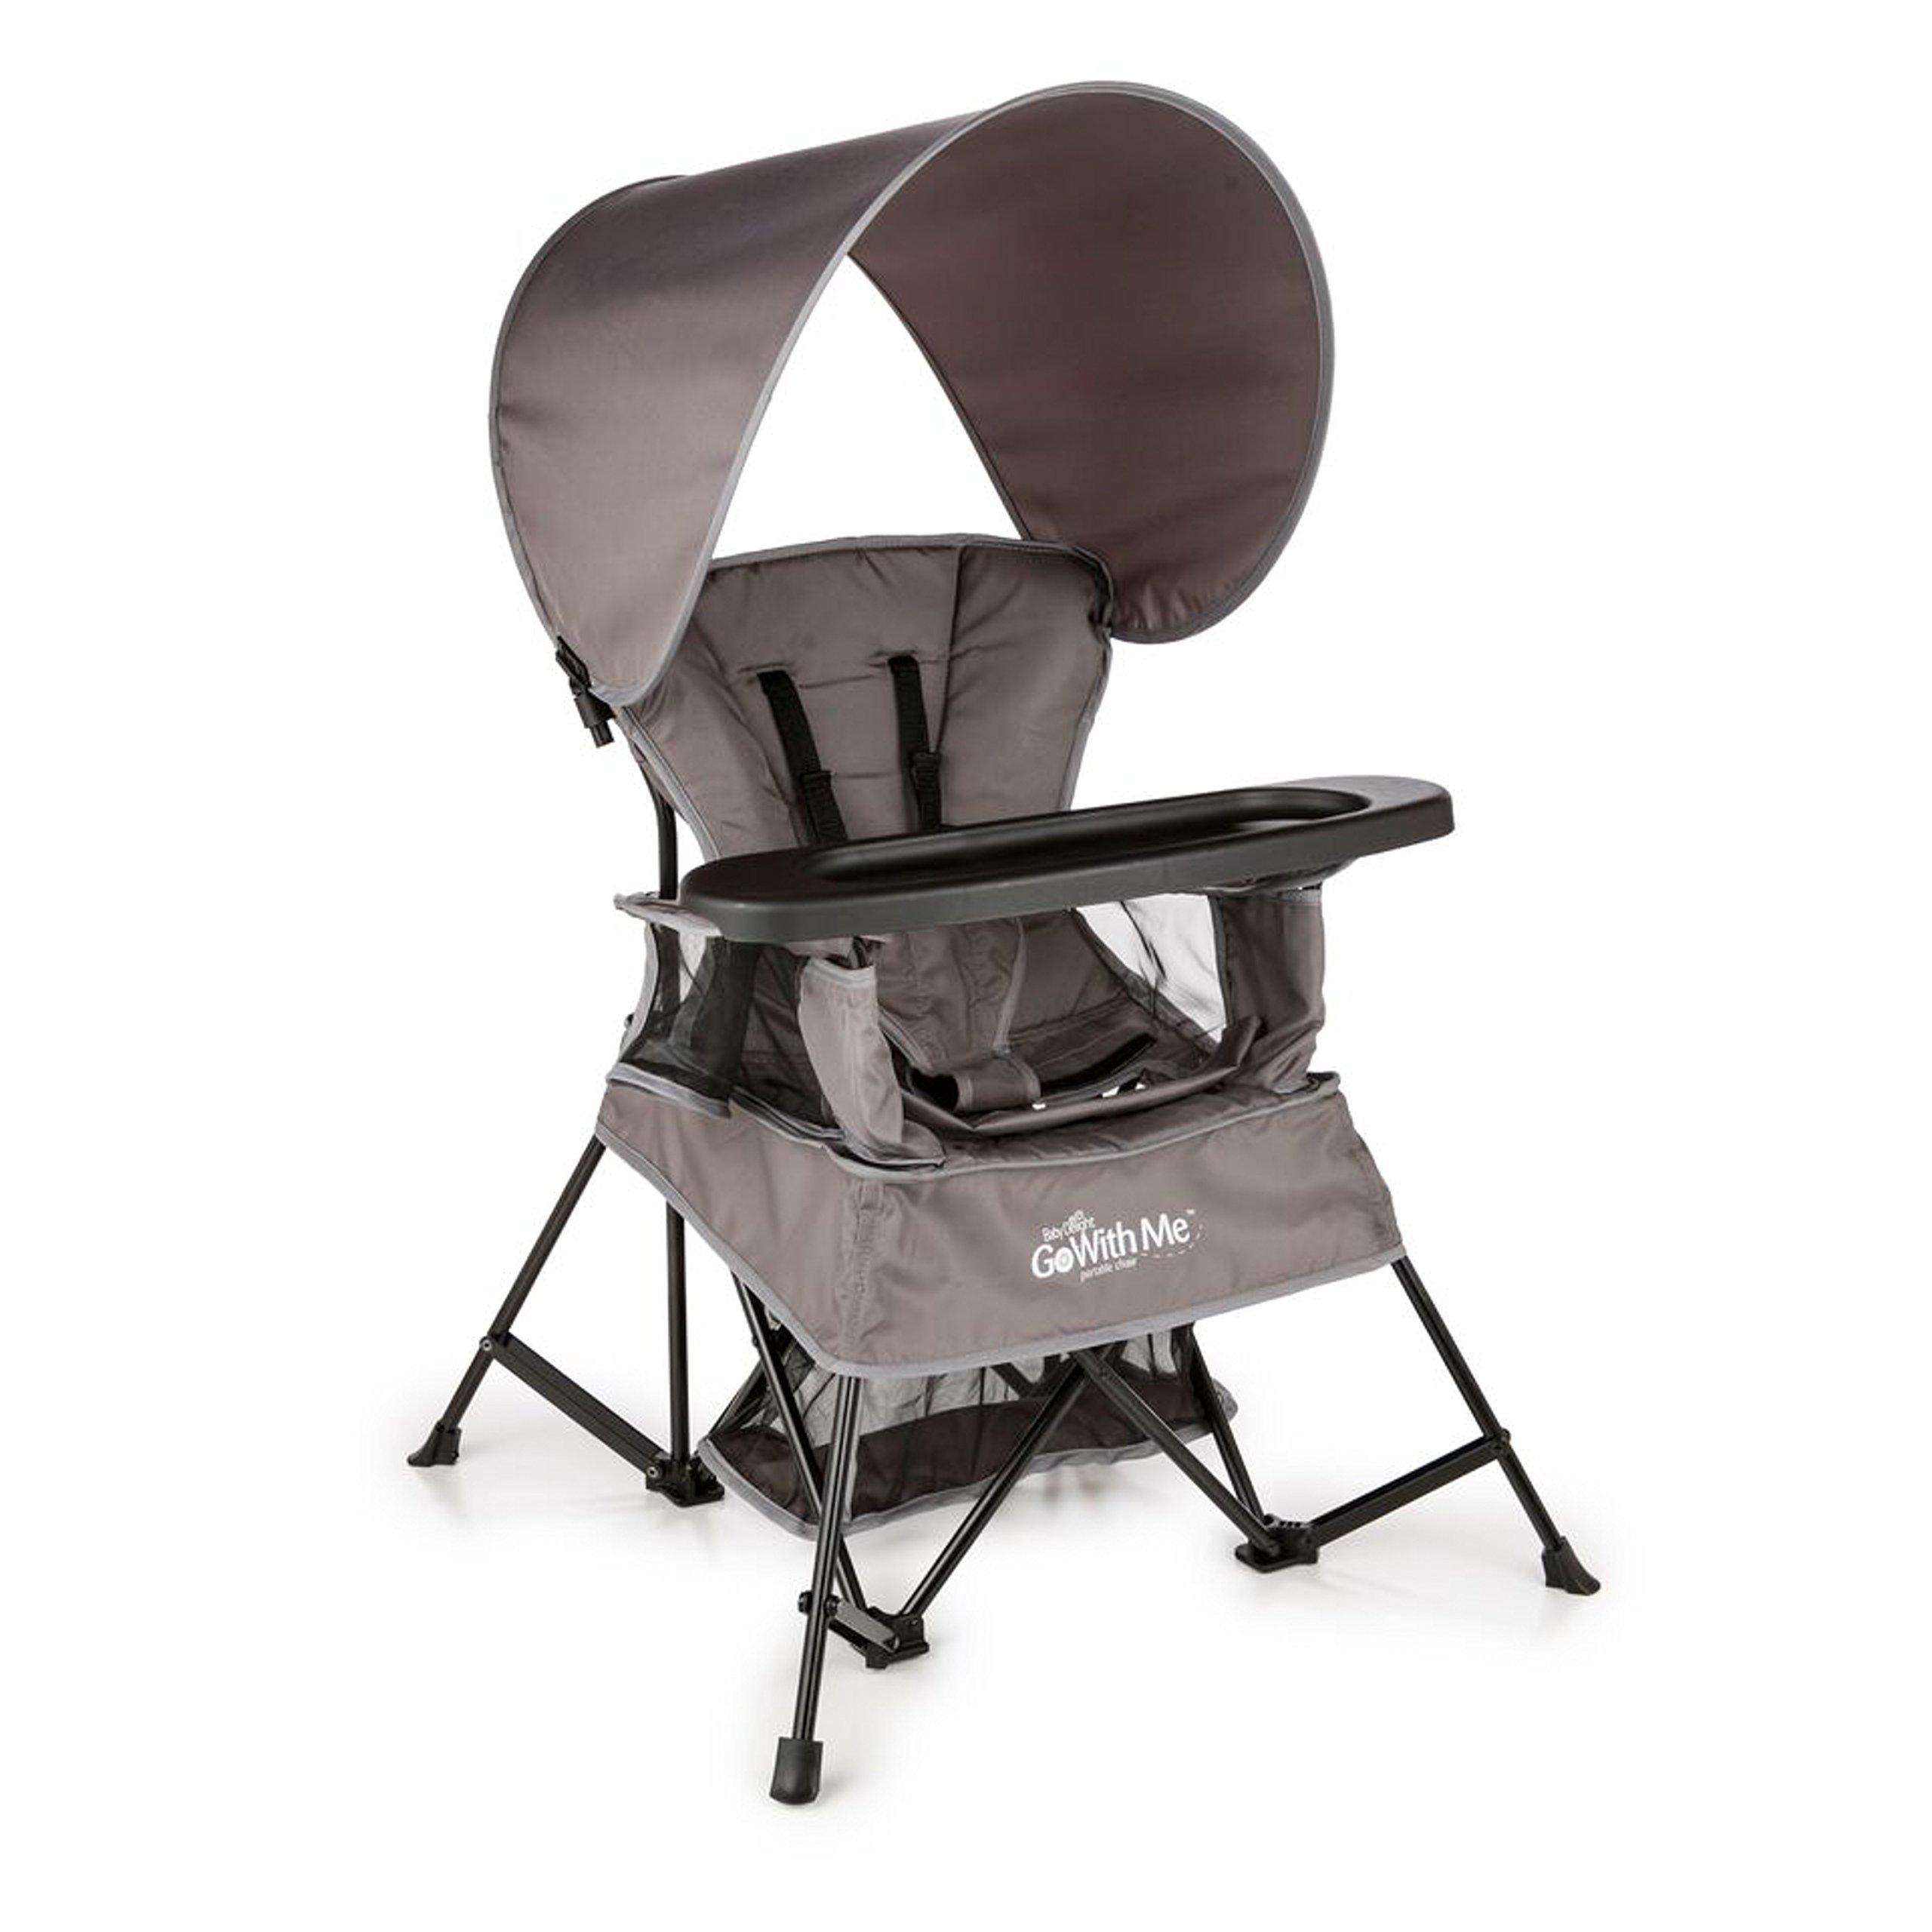 Baby Delight Outdoor Portable converts